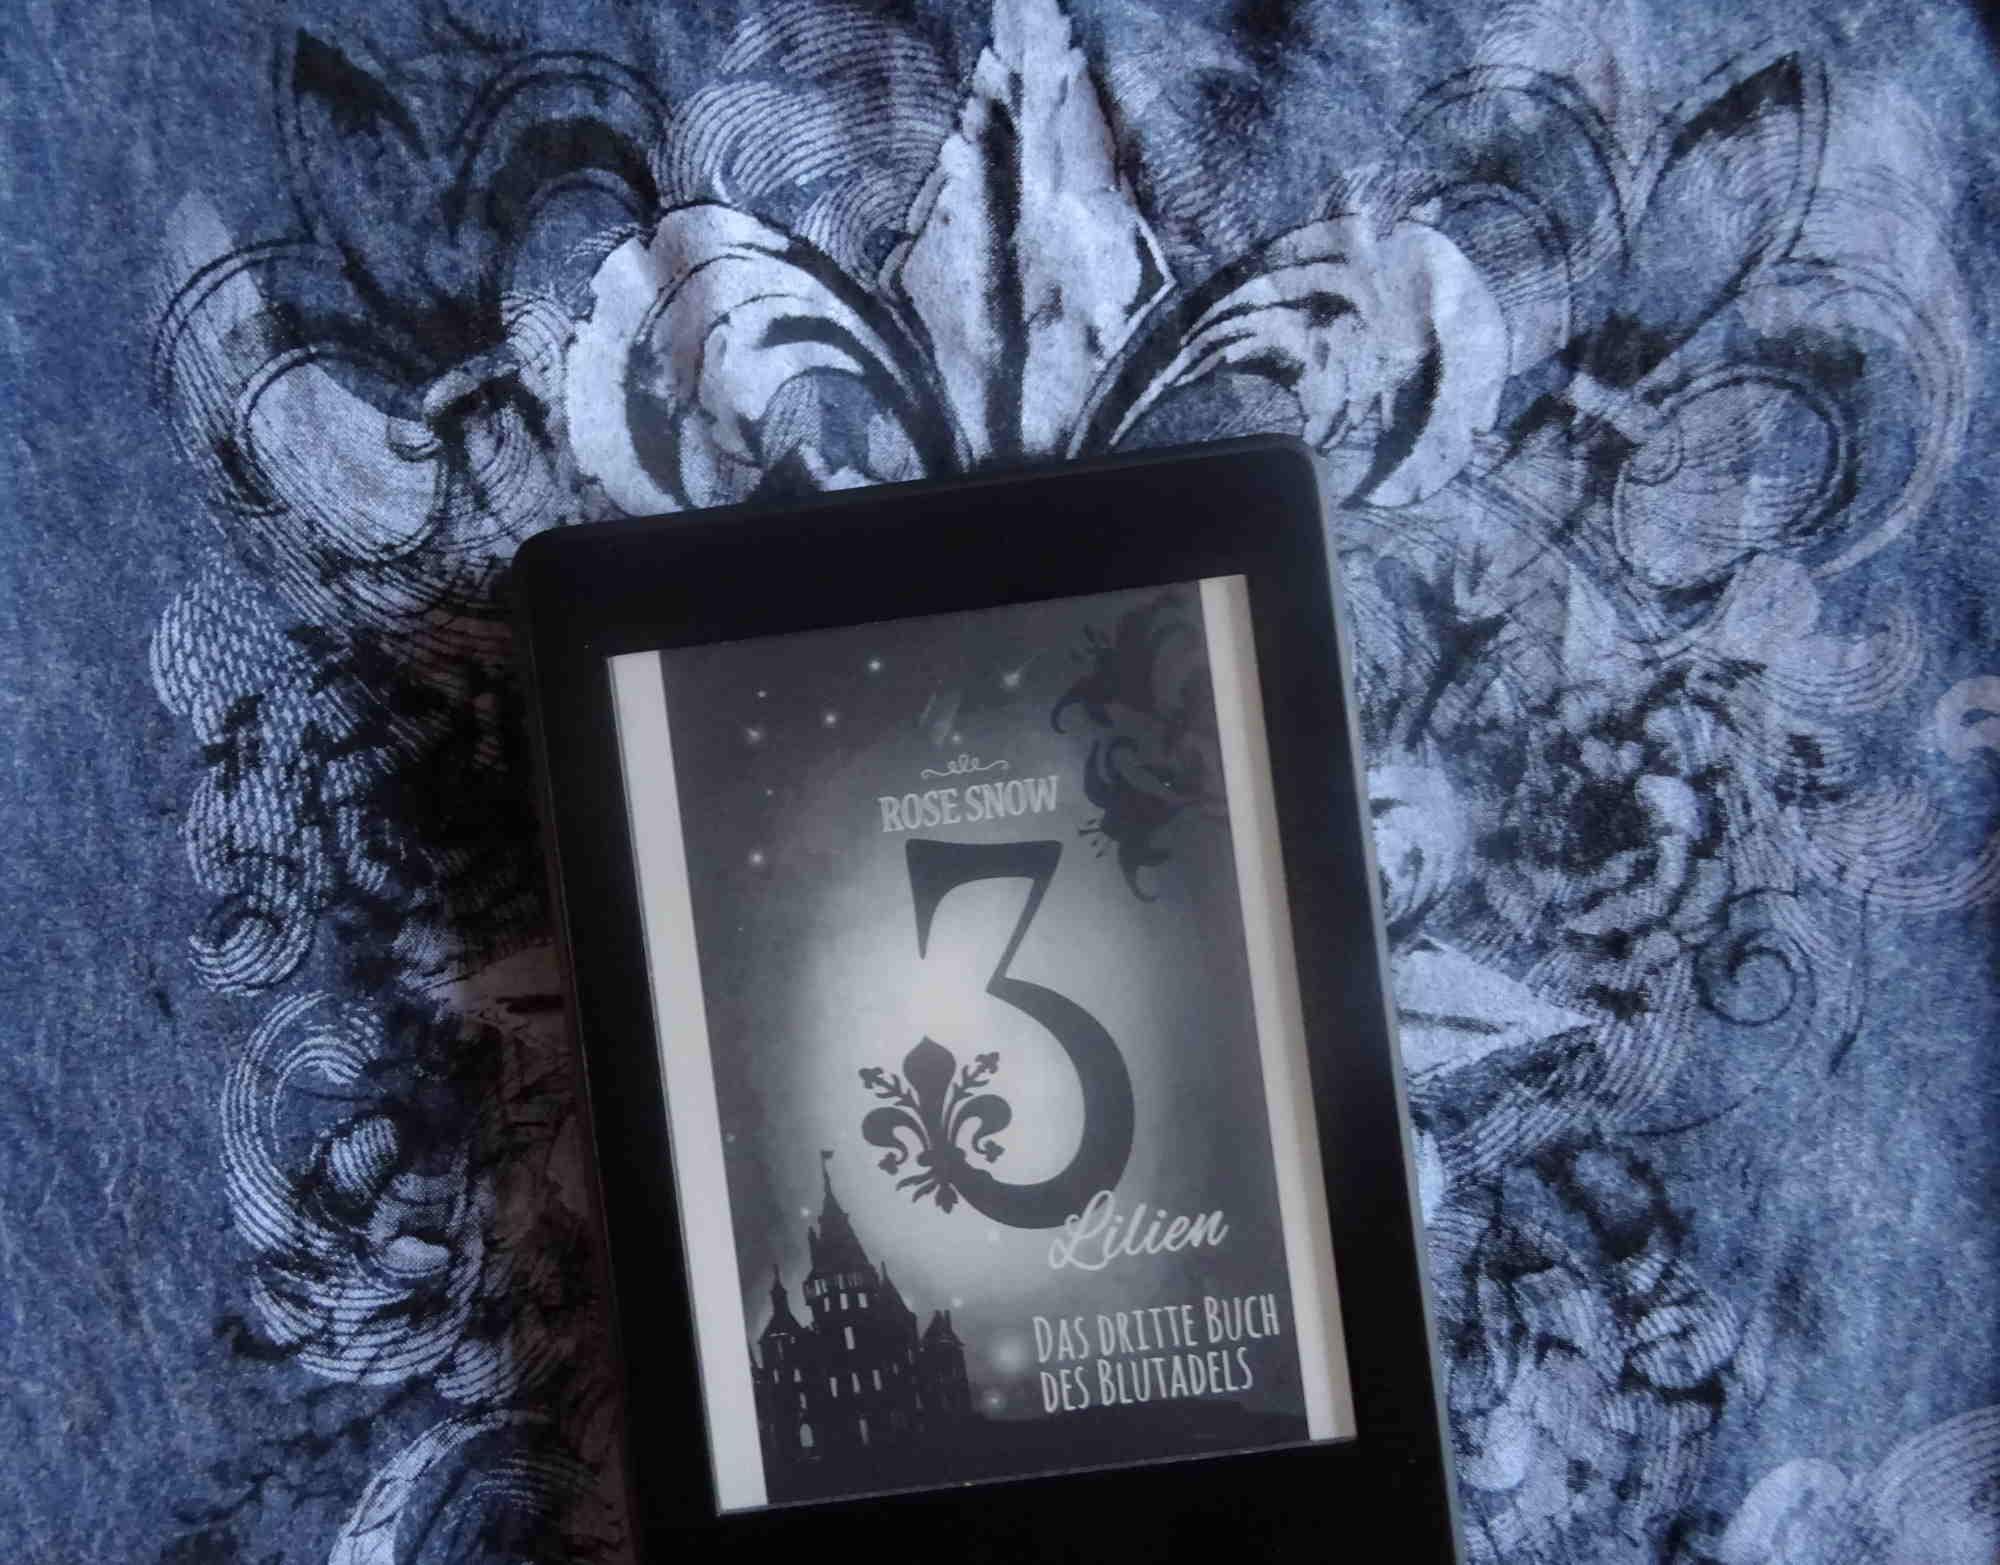 3 Lilien Das dritte Buch des Blutadels - Rose Snow